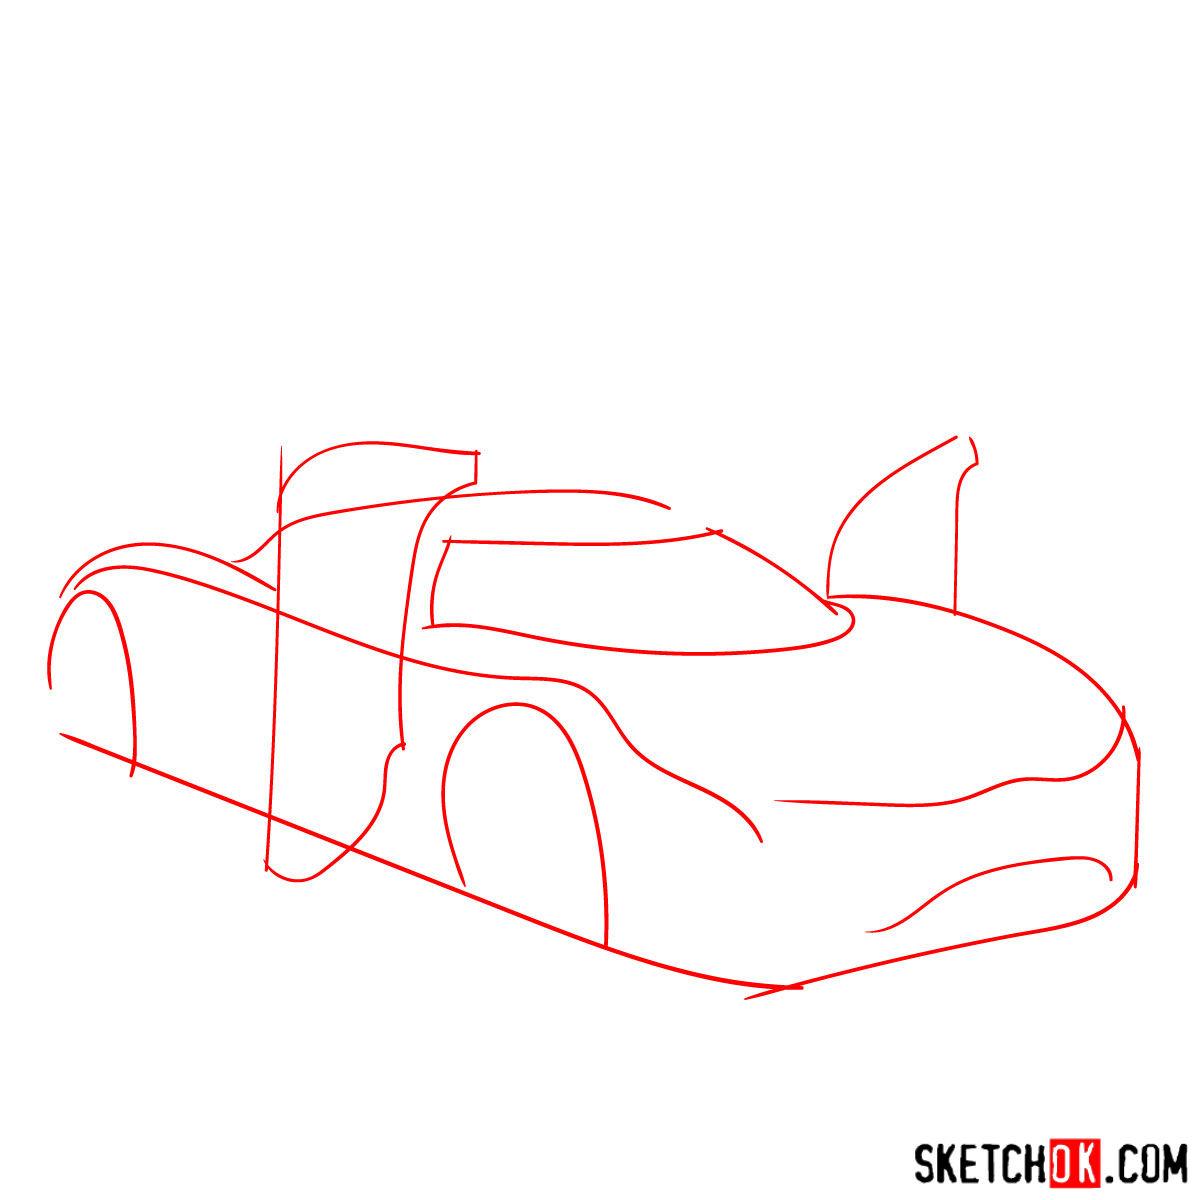 How to draw Koenigsegg Agera R Oman - step 01